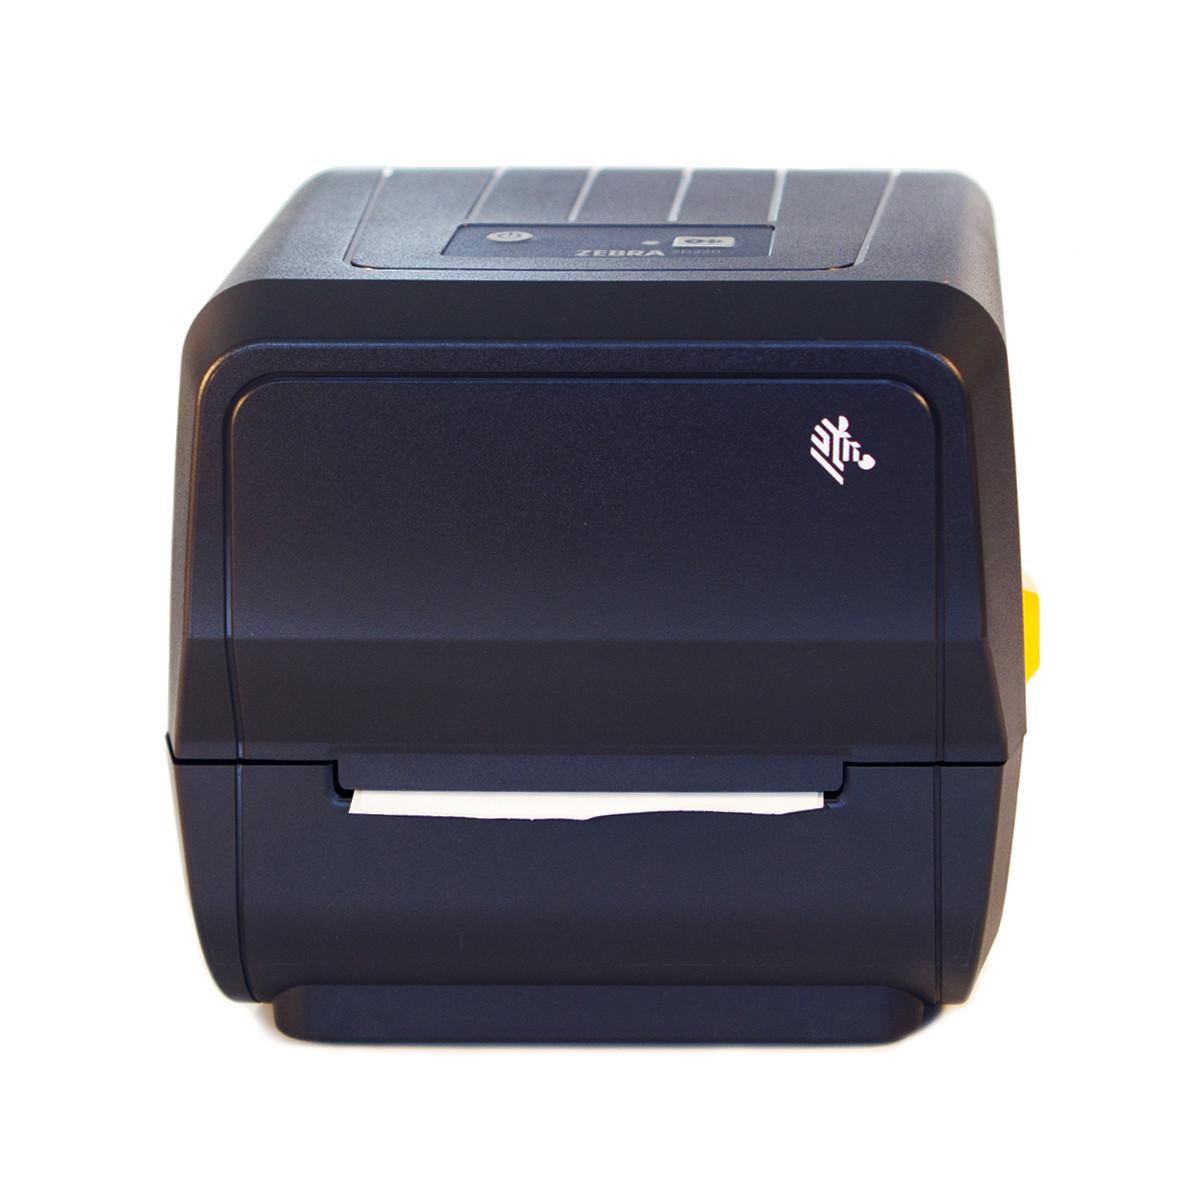 Impressora Térmica ZD220 203dpi USB   Zebra